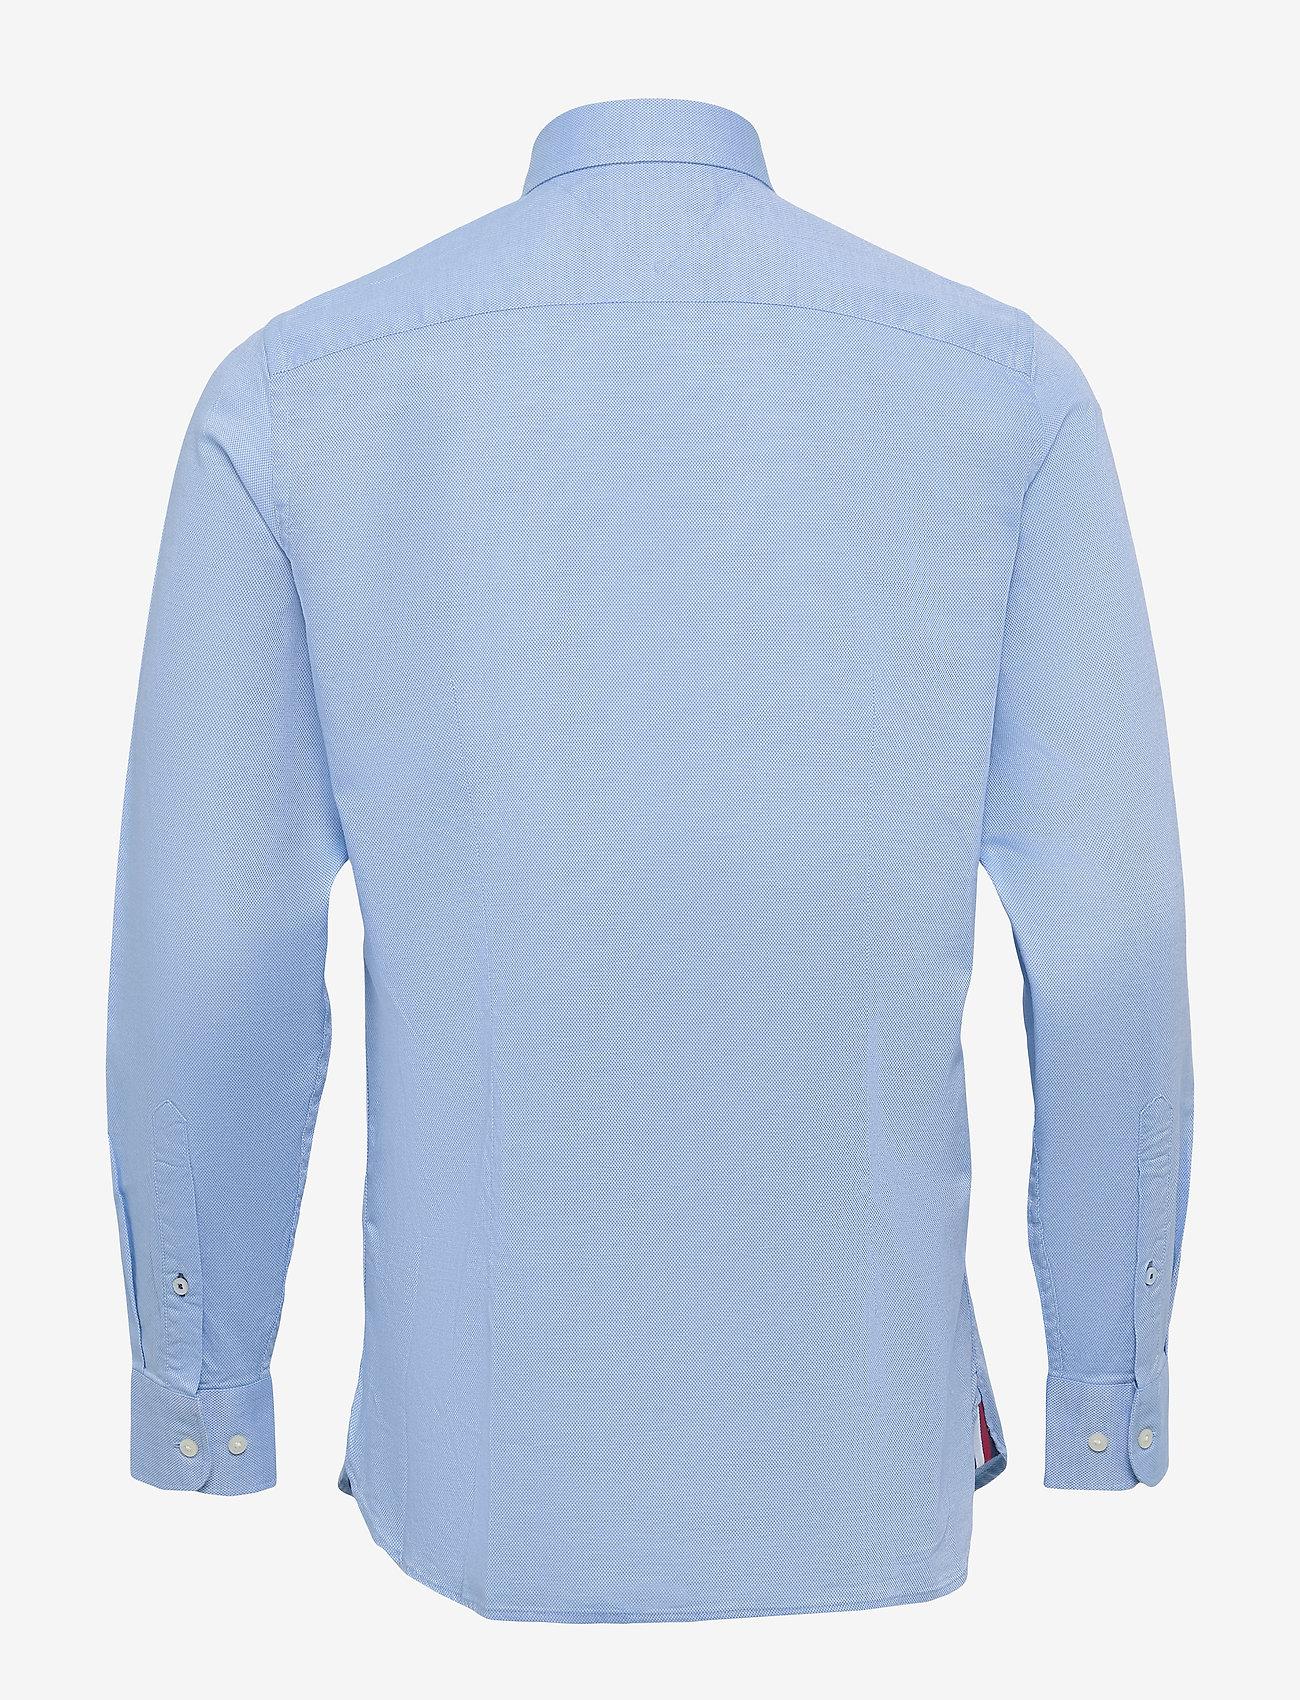 Tommy Hilfiger - SLIM FLEX ESSENTIAL DOBBY SHIRT - basic skjorter - copenhagen blue - 1